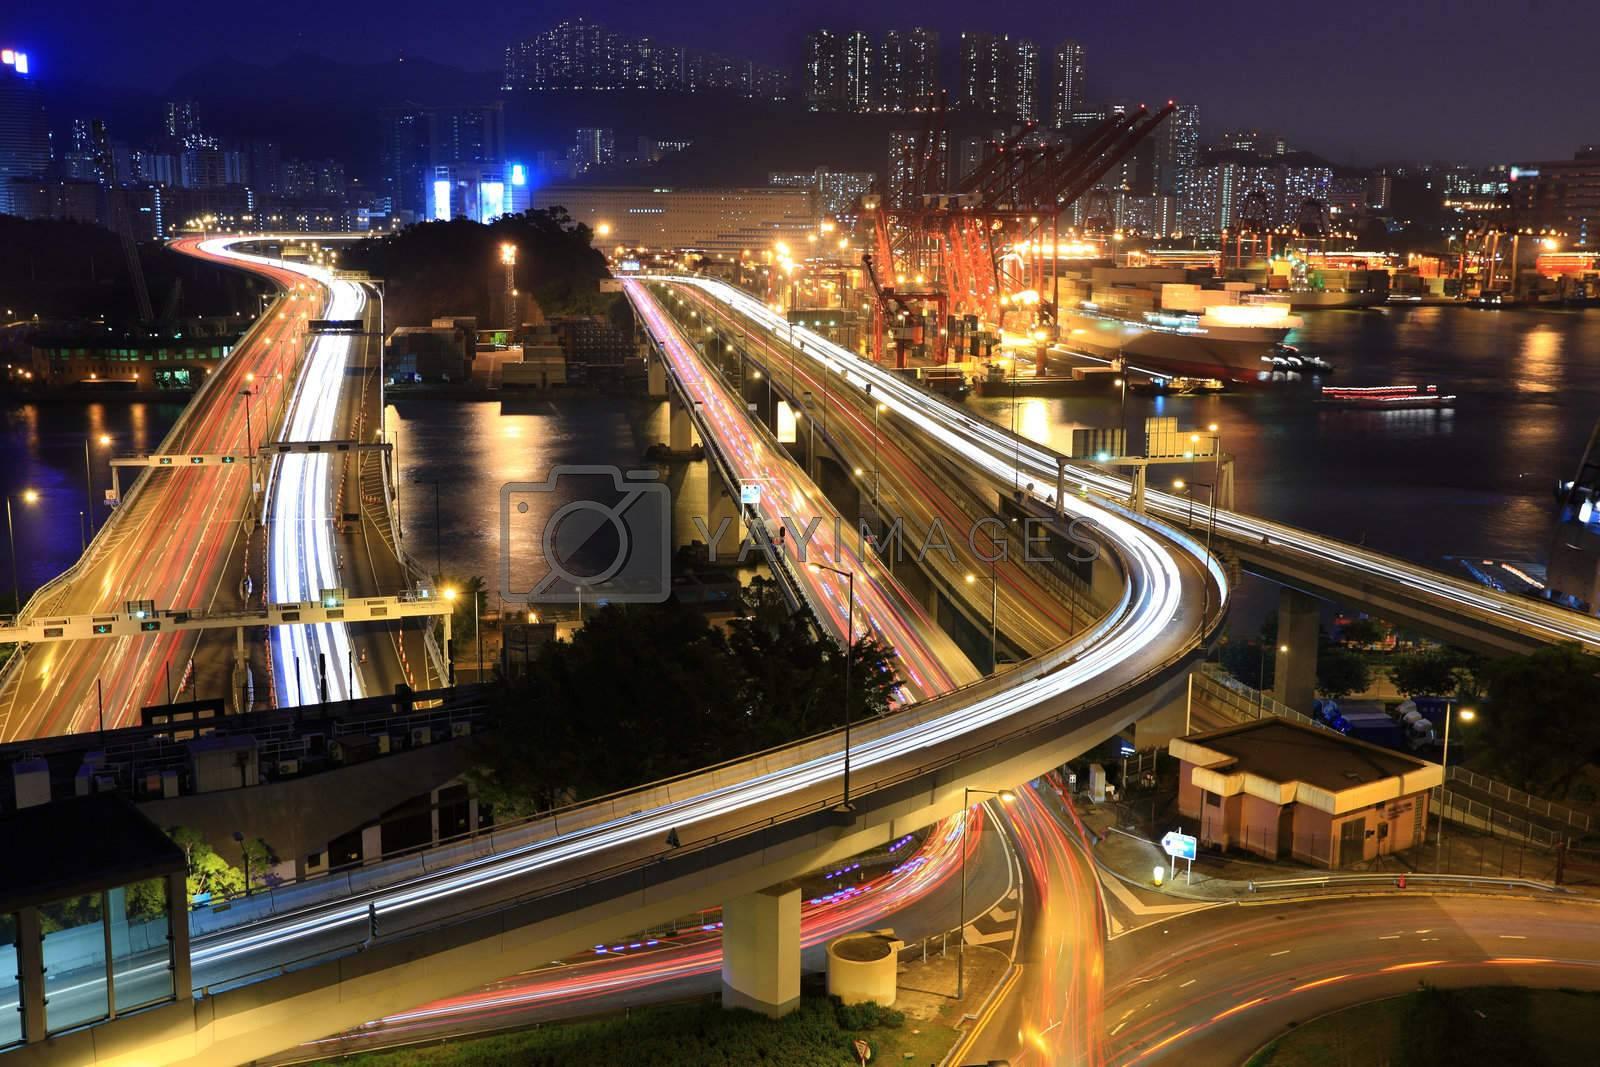 Cargo Terminal and highways of Hong Kong China by leungchopan